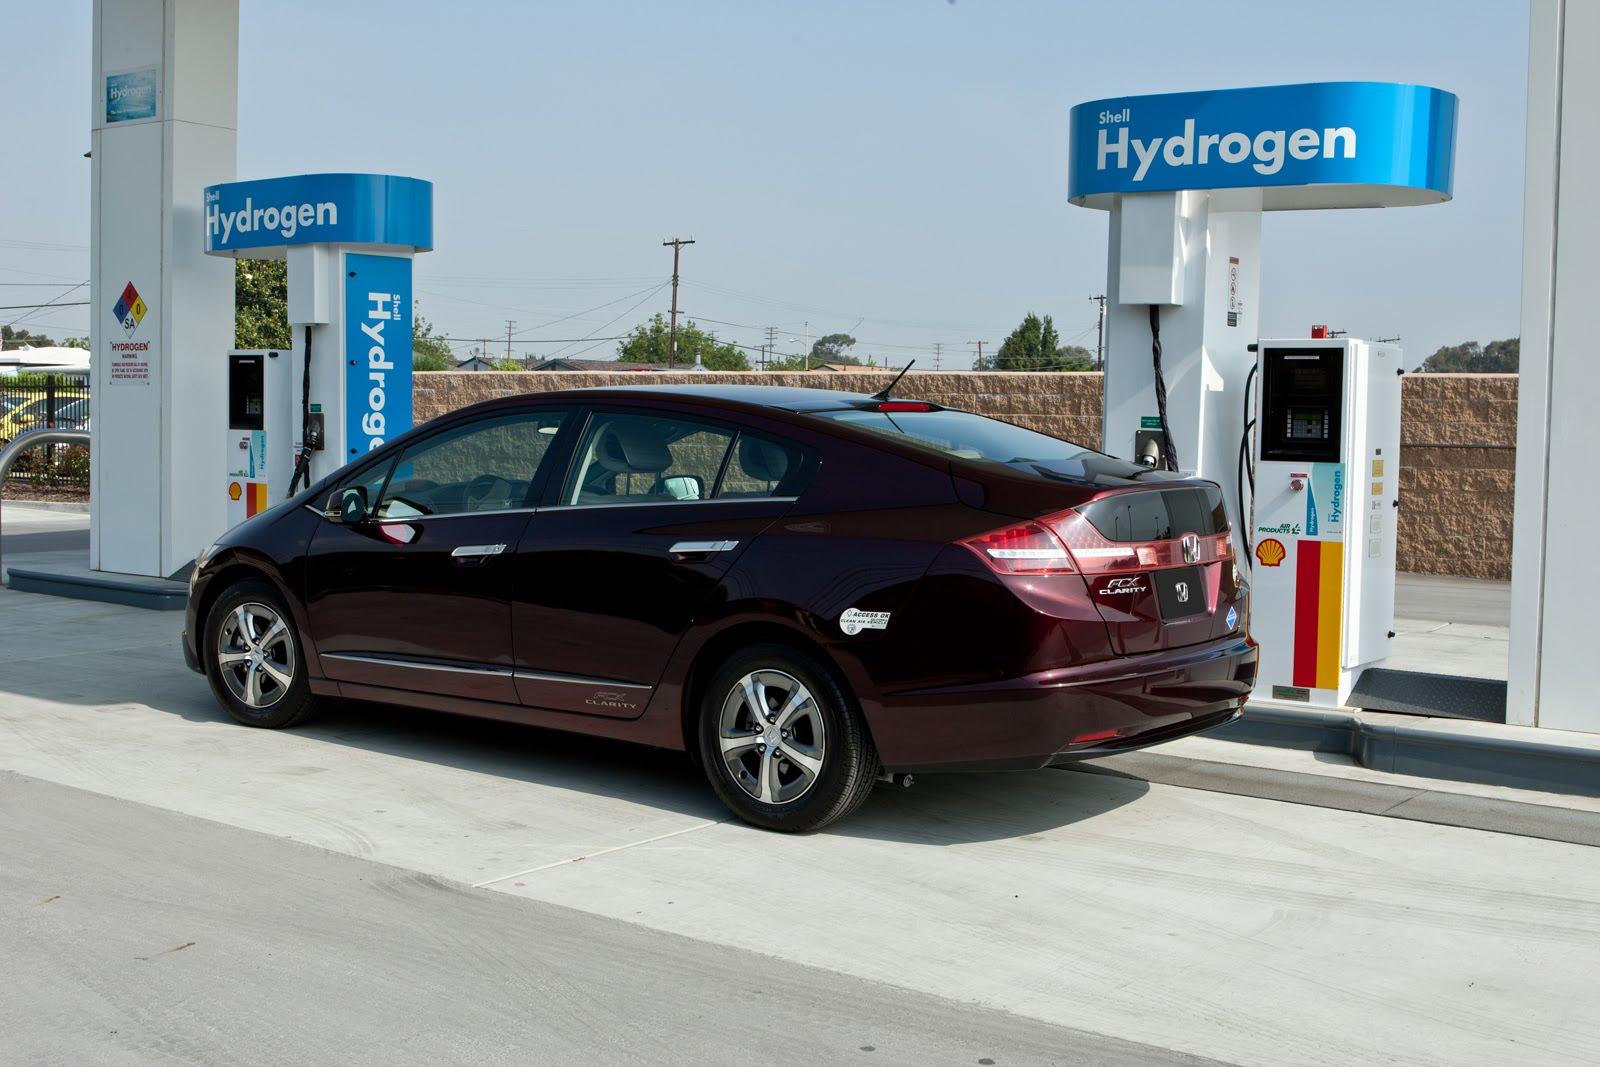 Honda CCX Clarity respostando hidrogeno. Coolpicturegallery